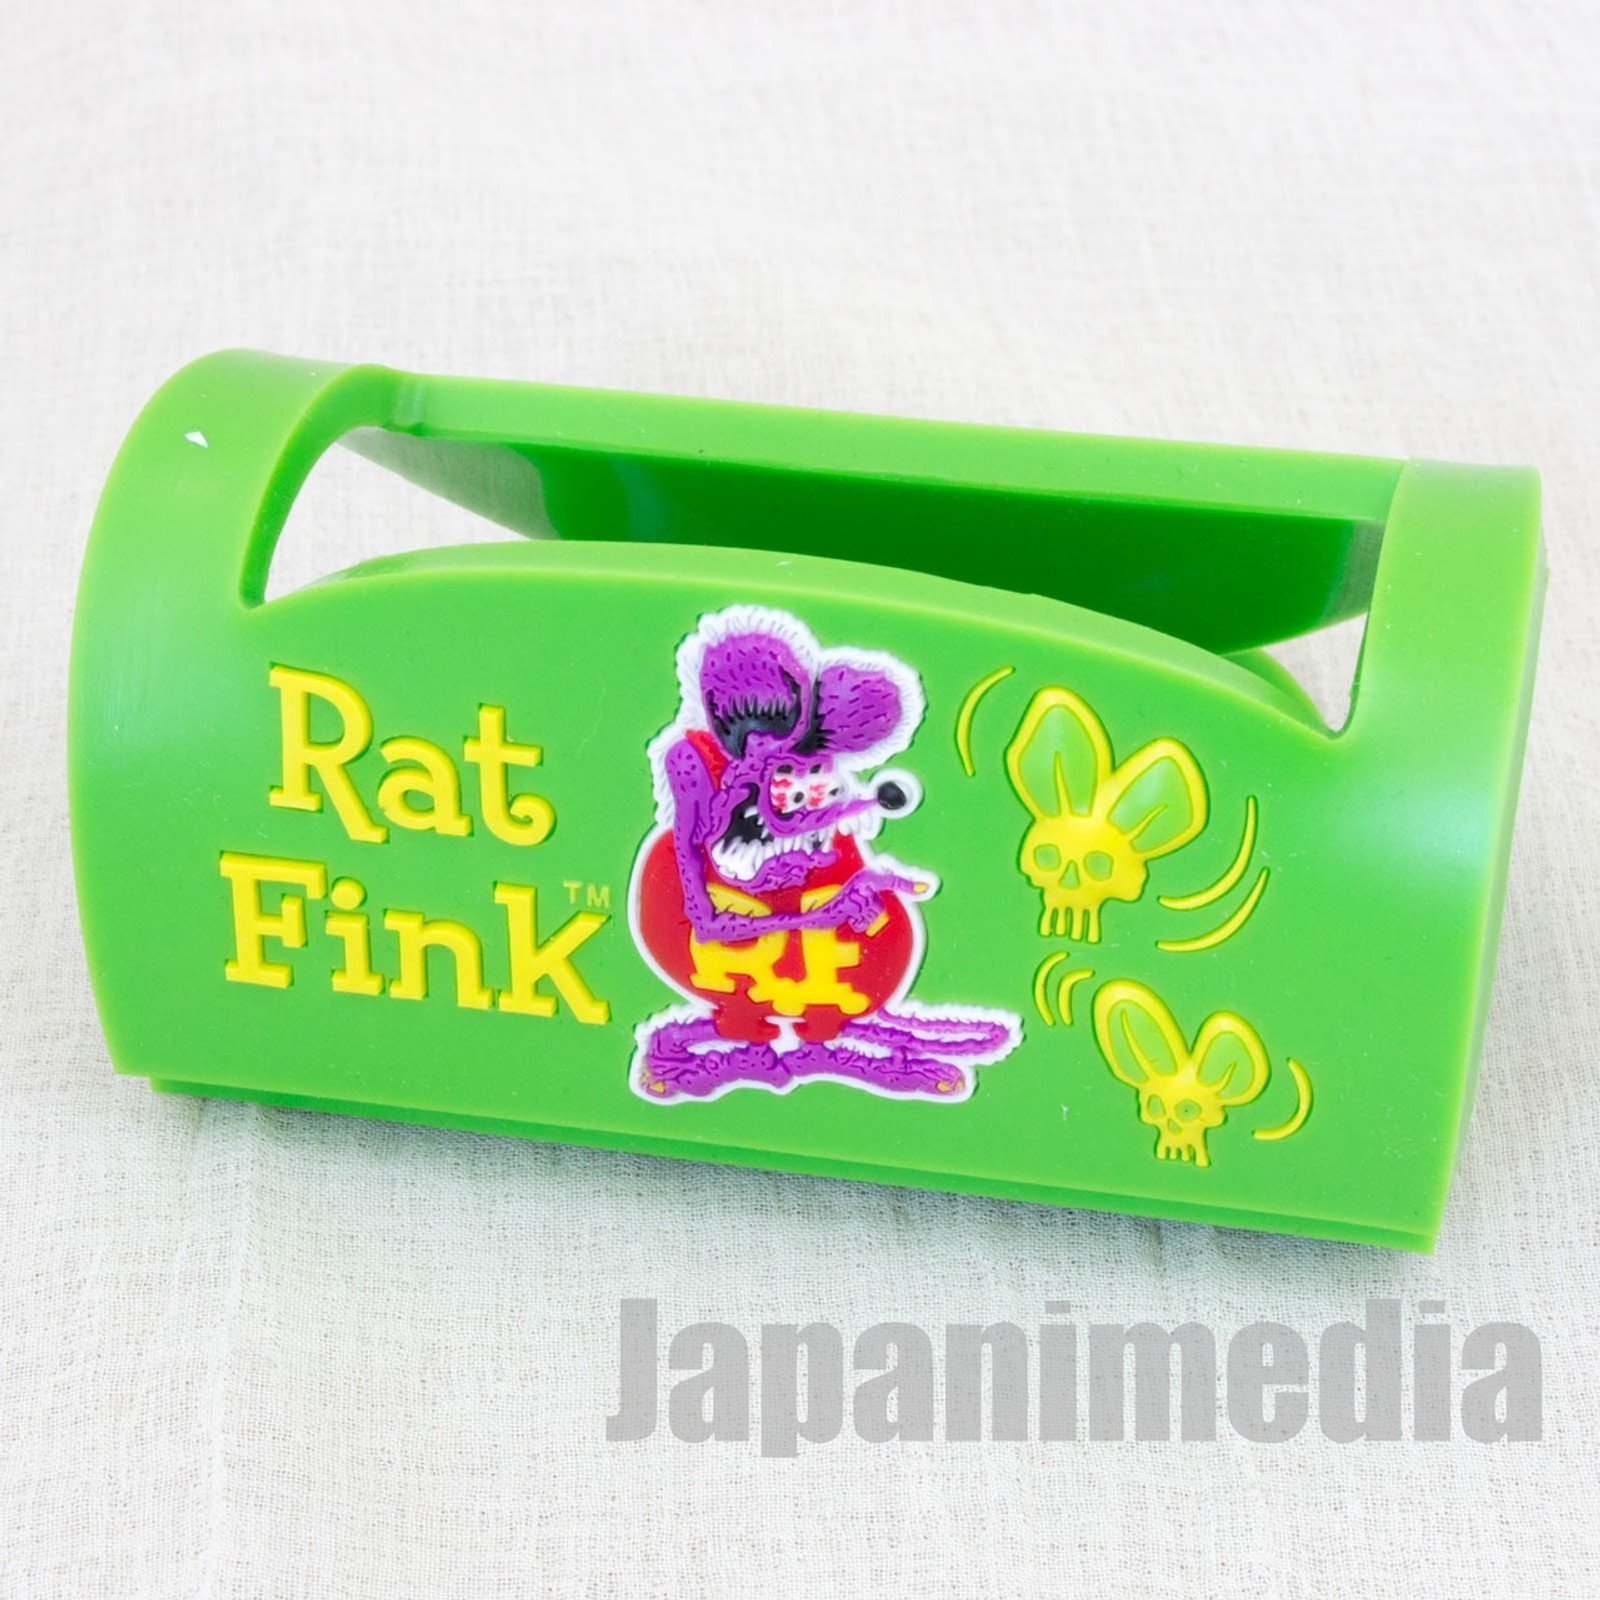 RAT FINK Rubber Multi Holder Smart Phone Stand Green Ver. ED ROTH MOONEYES